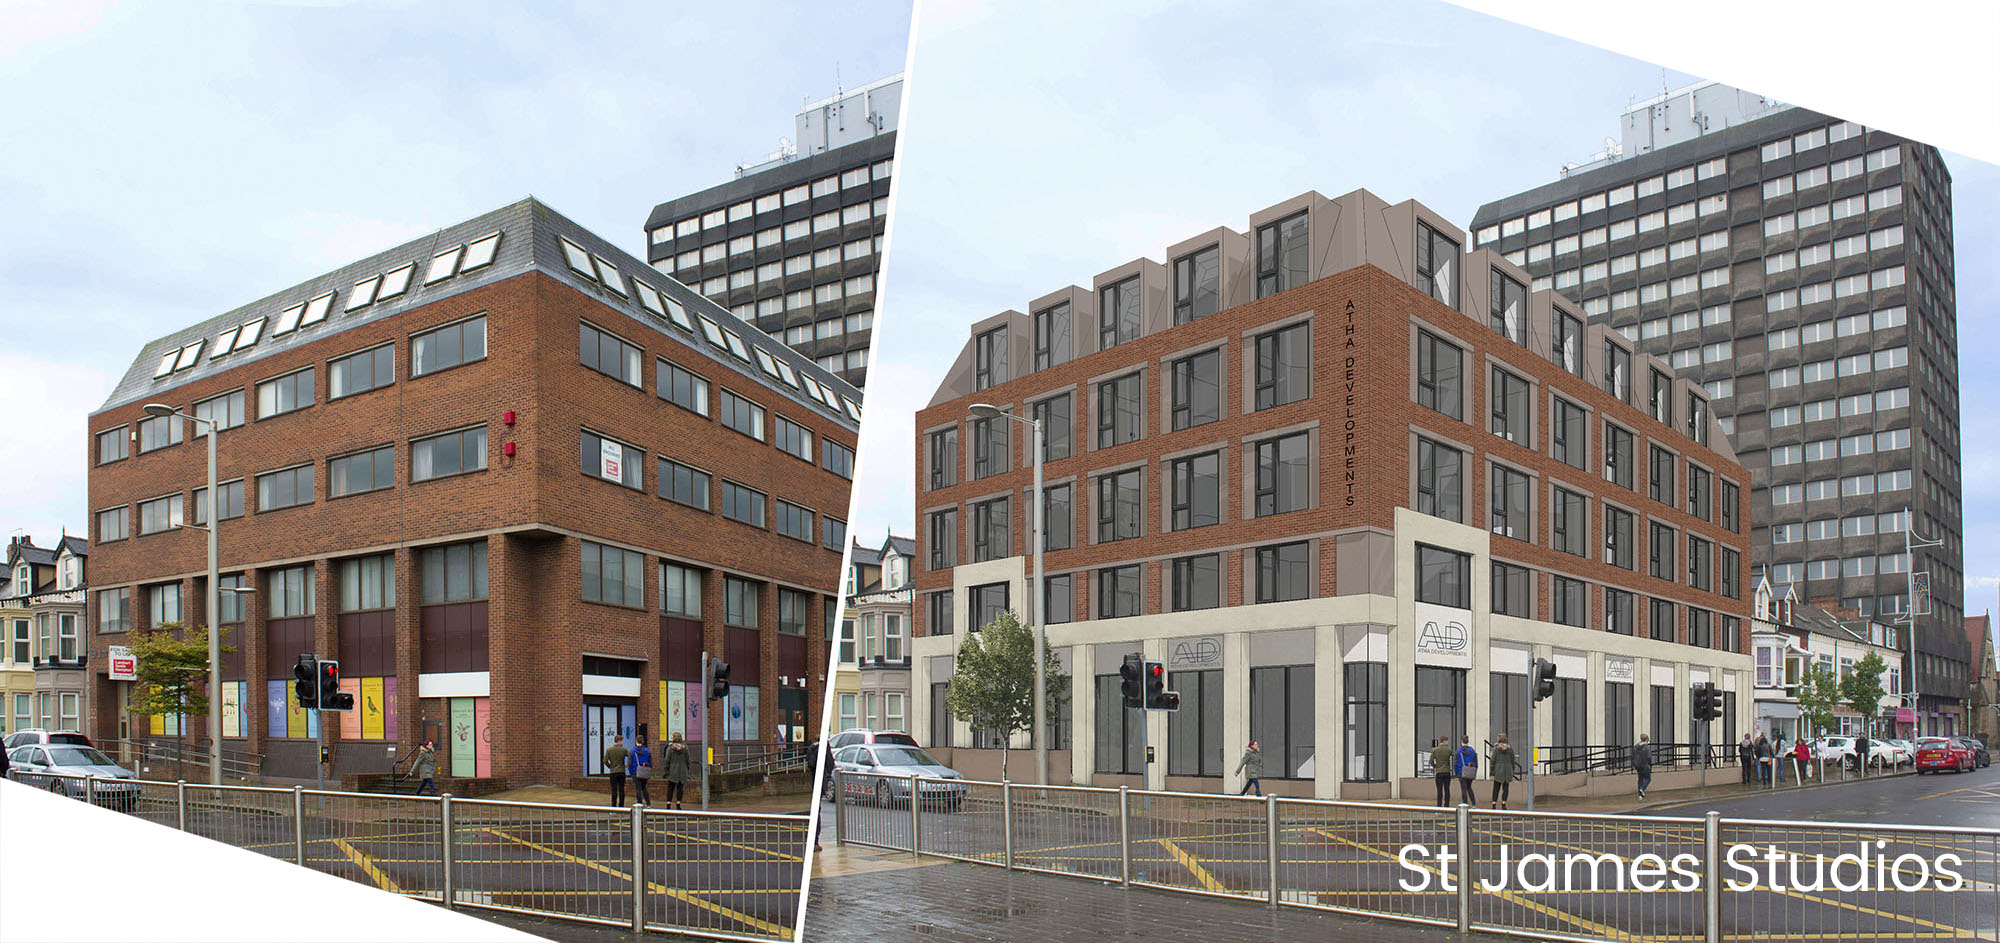 Niven Architects - St James Studios.jpg